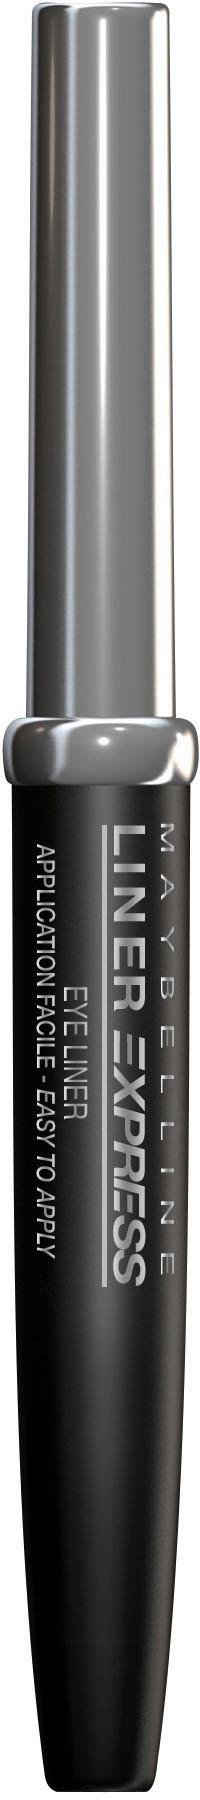 MAYBELLINE NEW YORK Eyeliner »Liner Express«, Feine Filzspitze